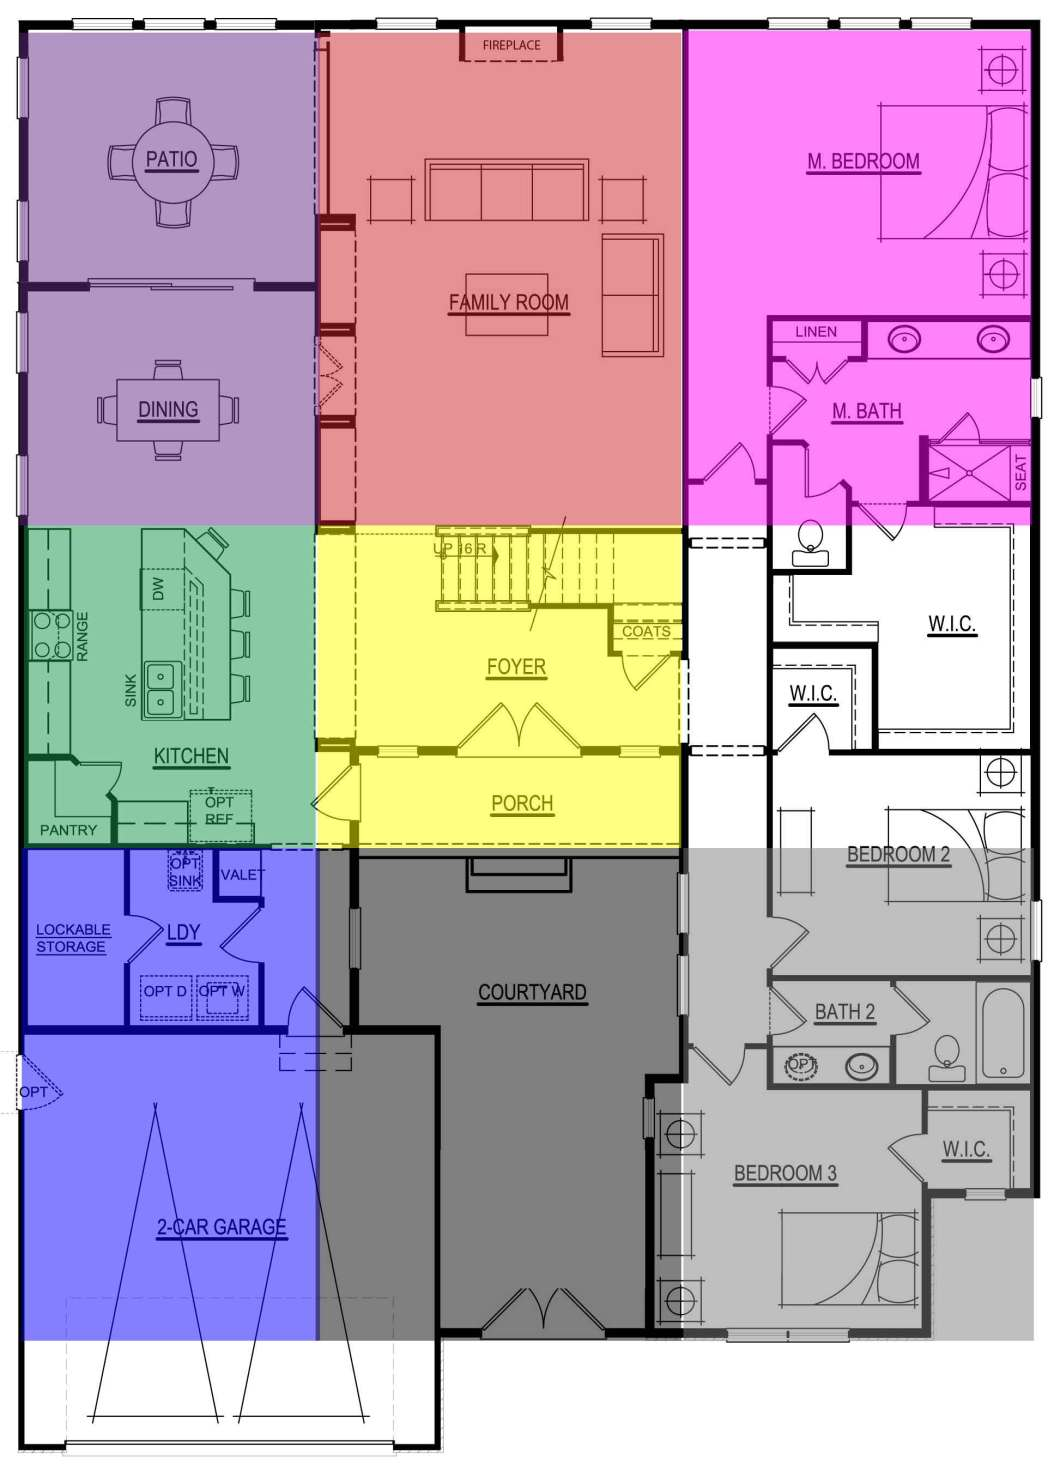 Feng shui bedroom layout bagua for Good bedroom layouts